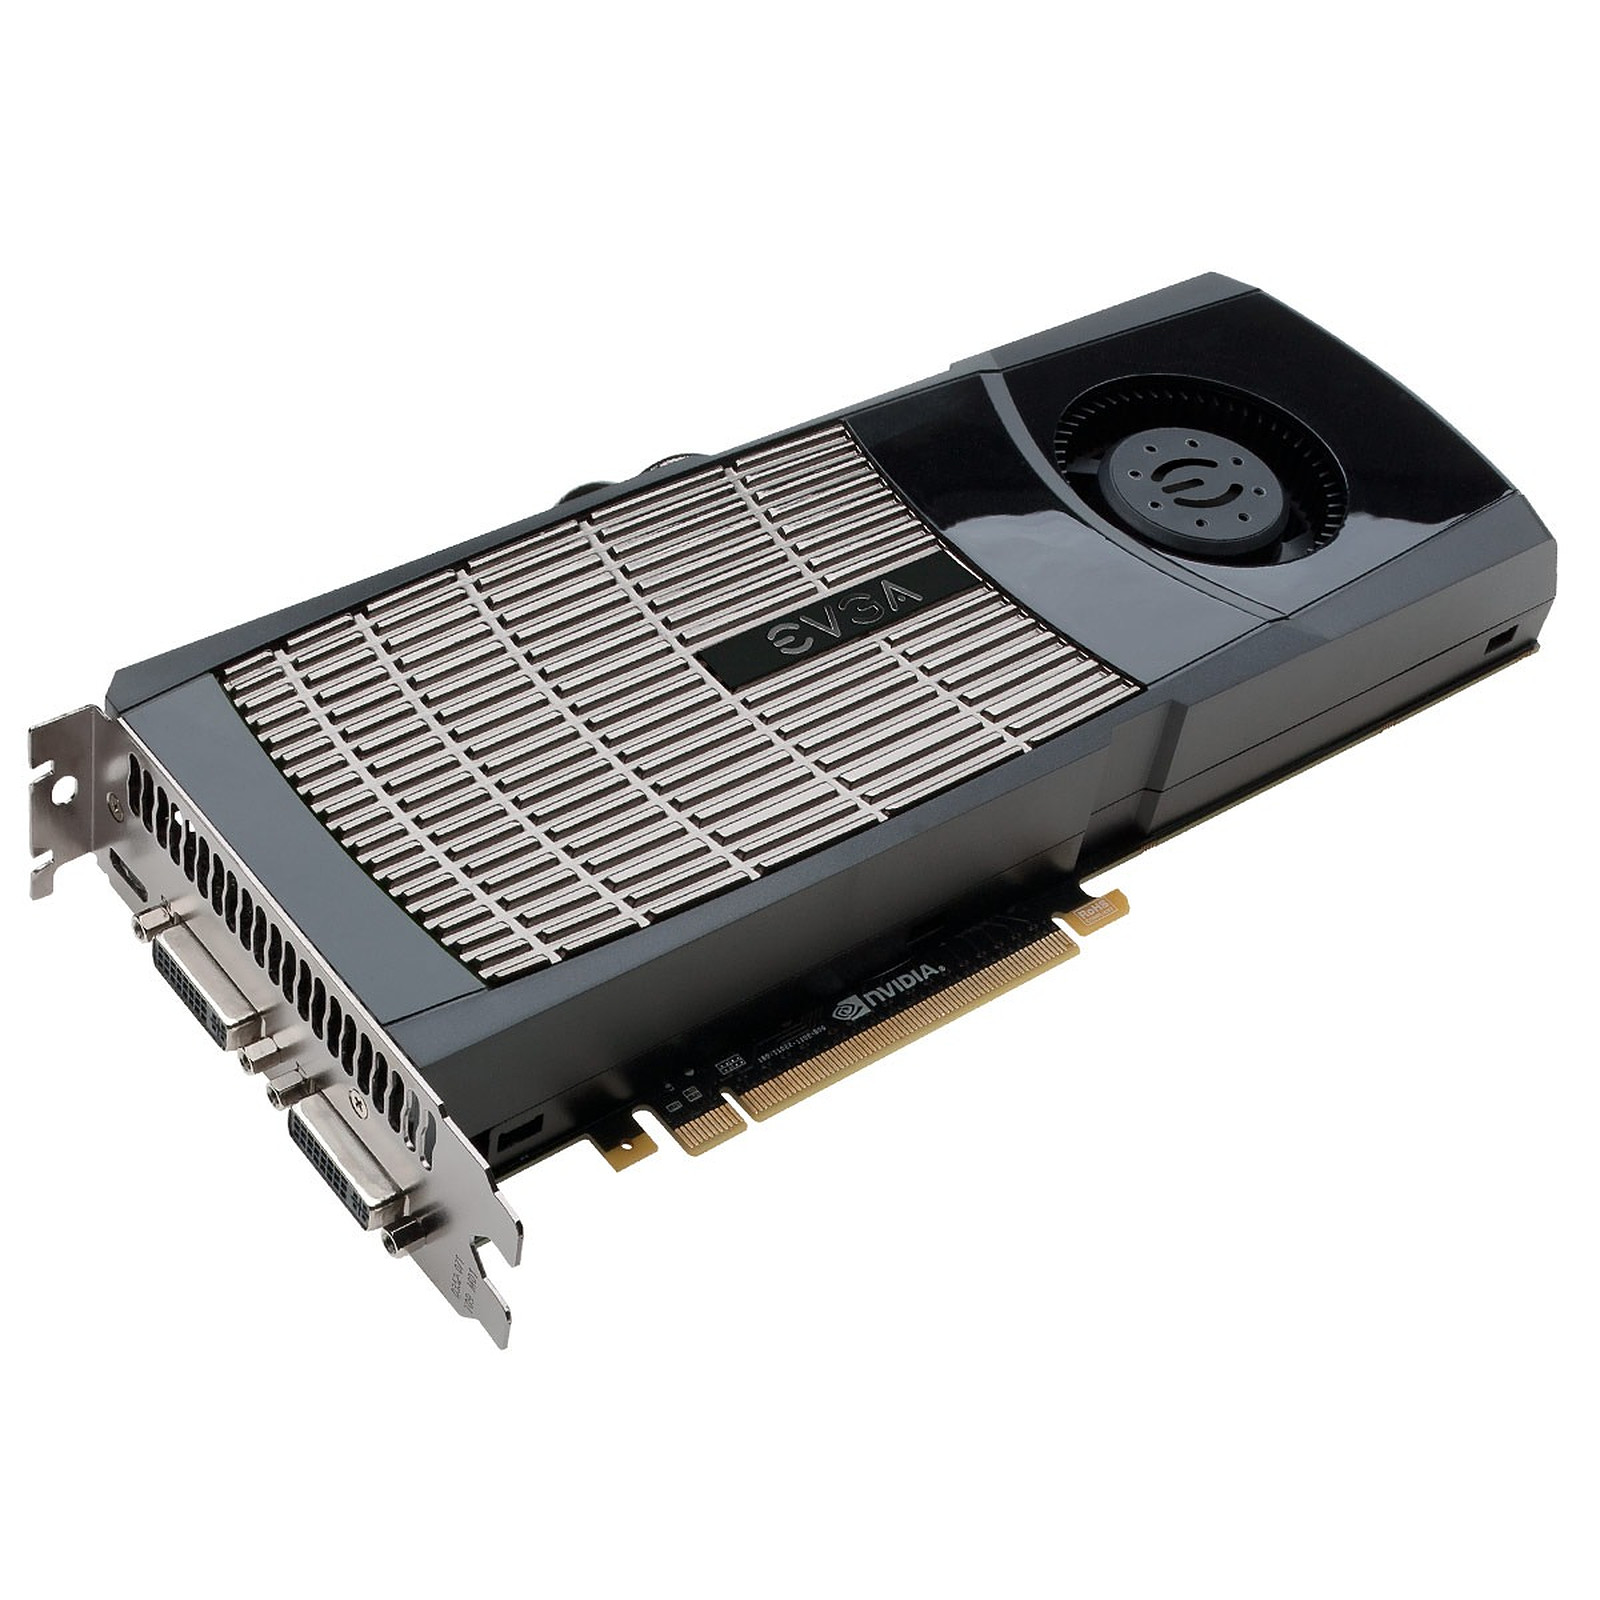 EVGA GeForce GTX 480 SuperClocked